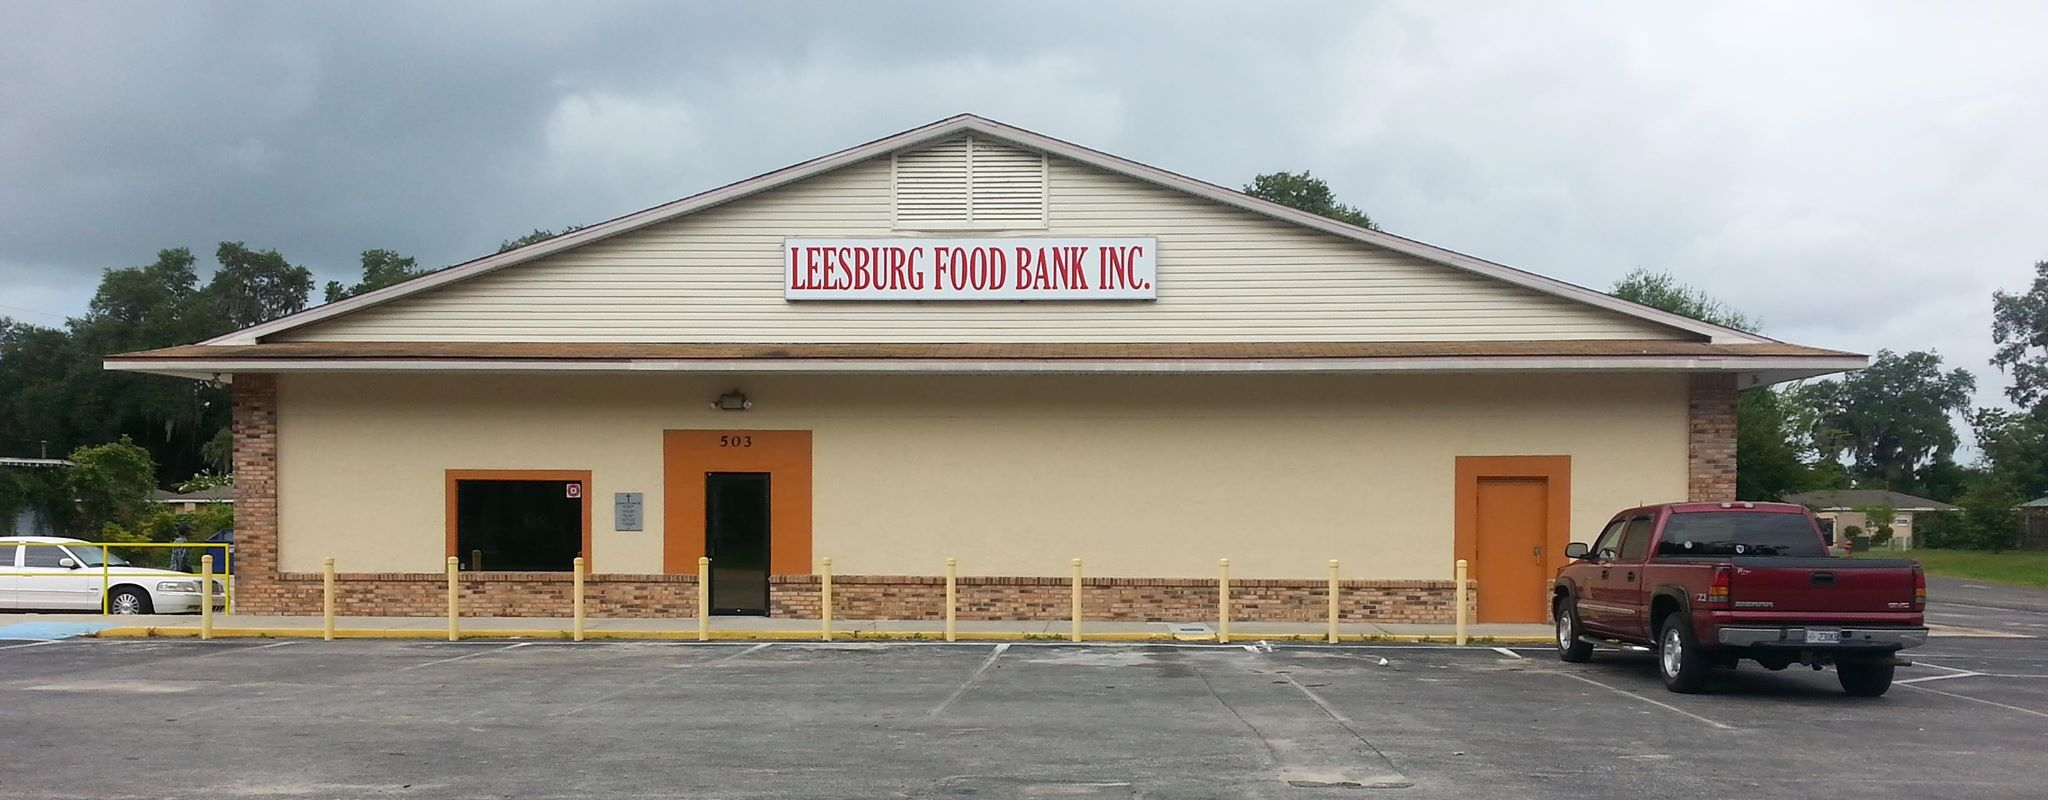 Leesburg Food Bank Inc